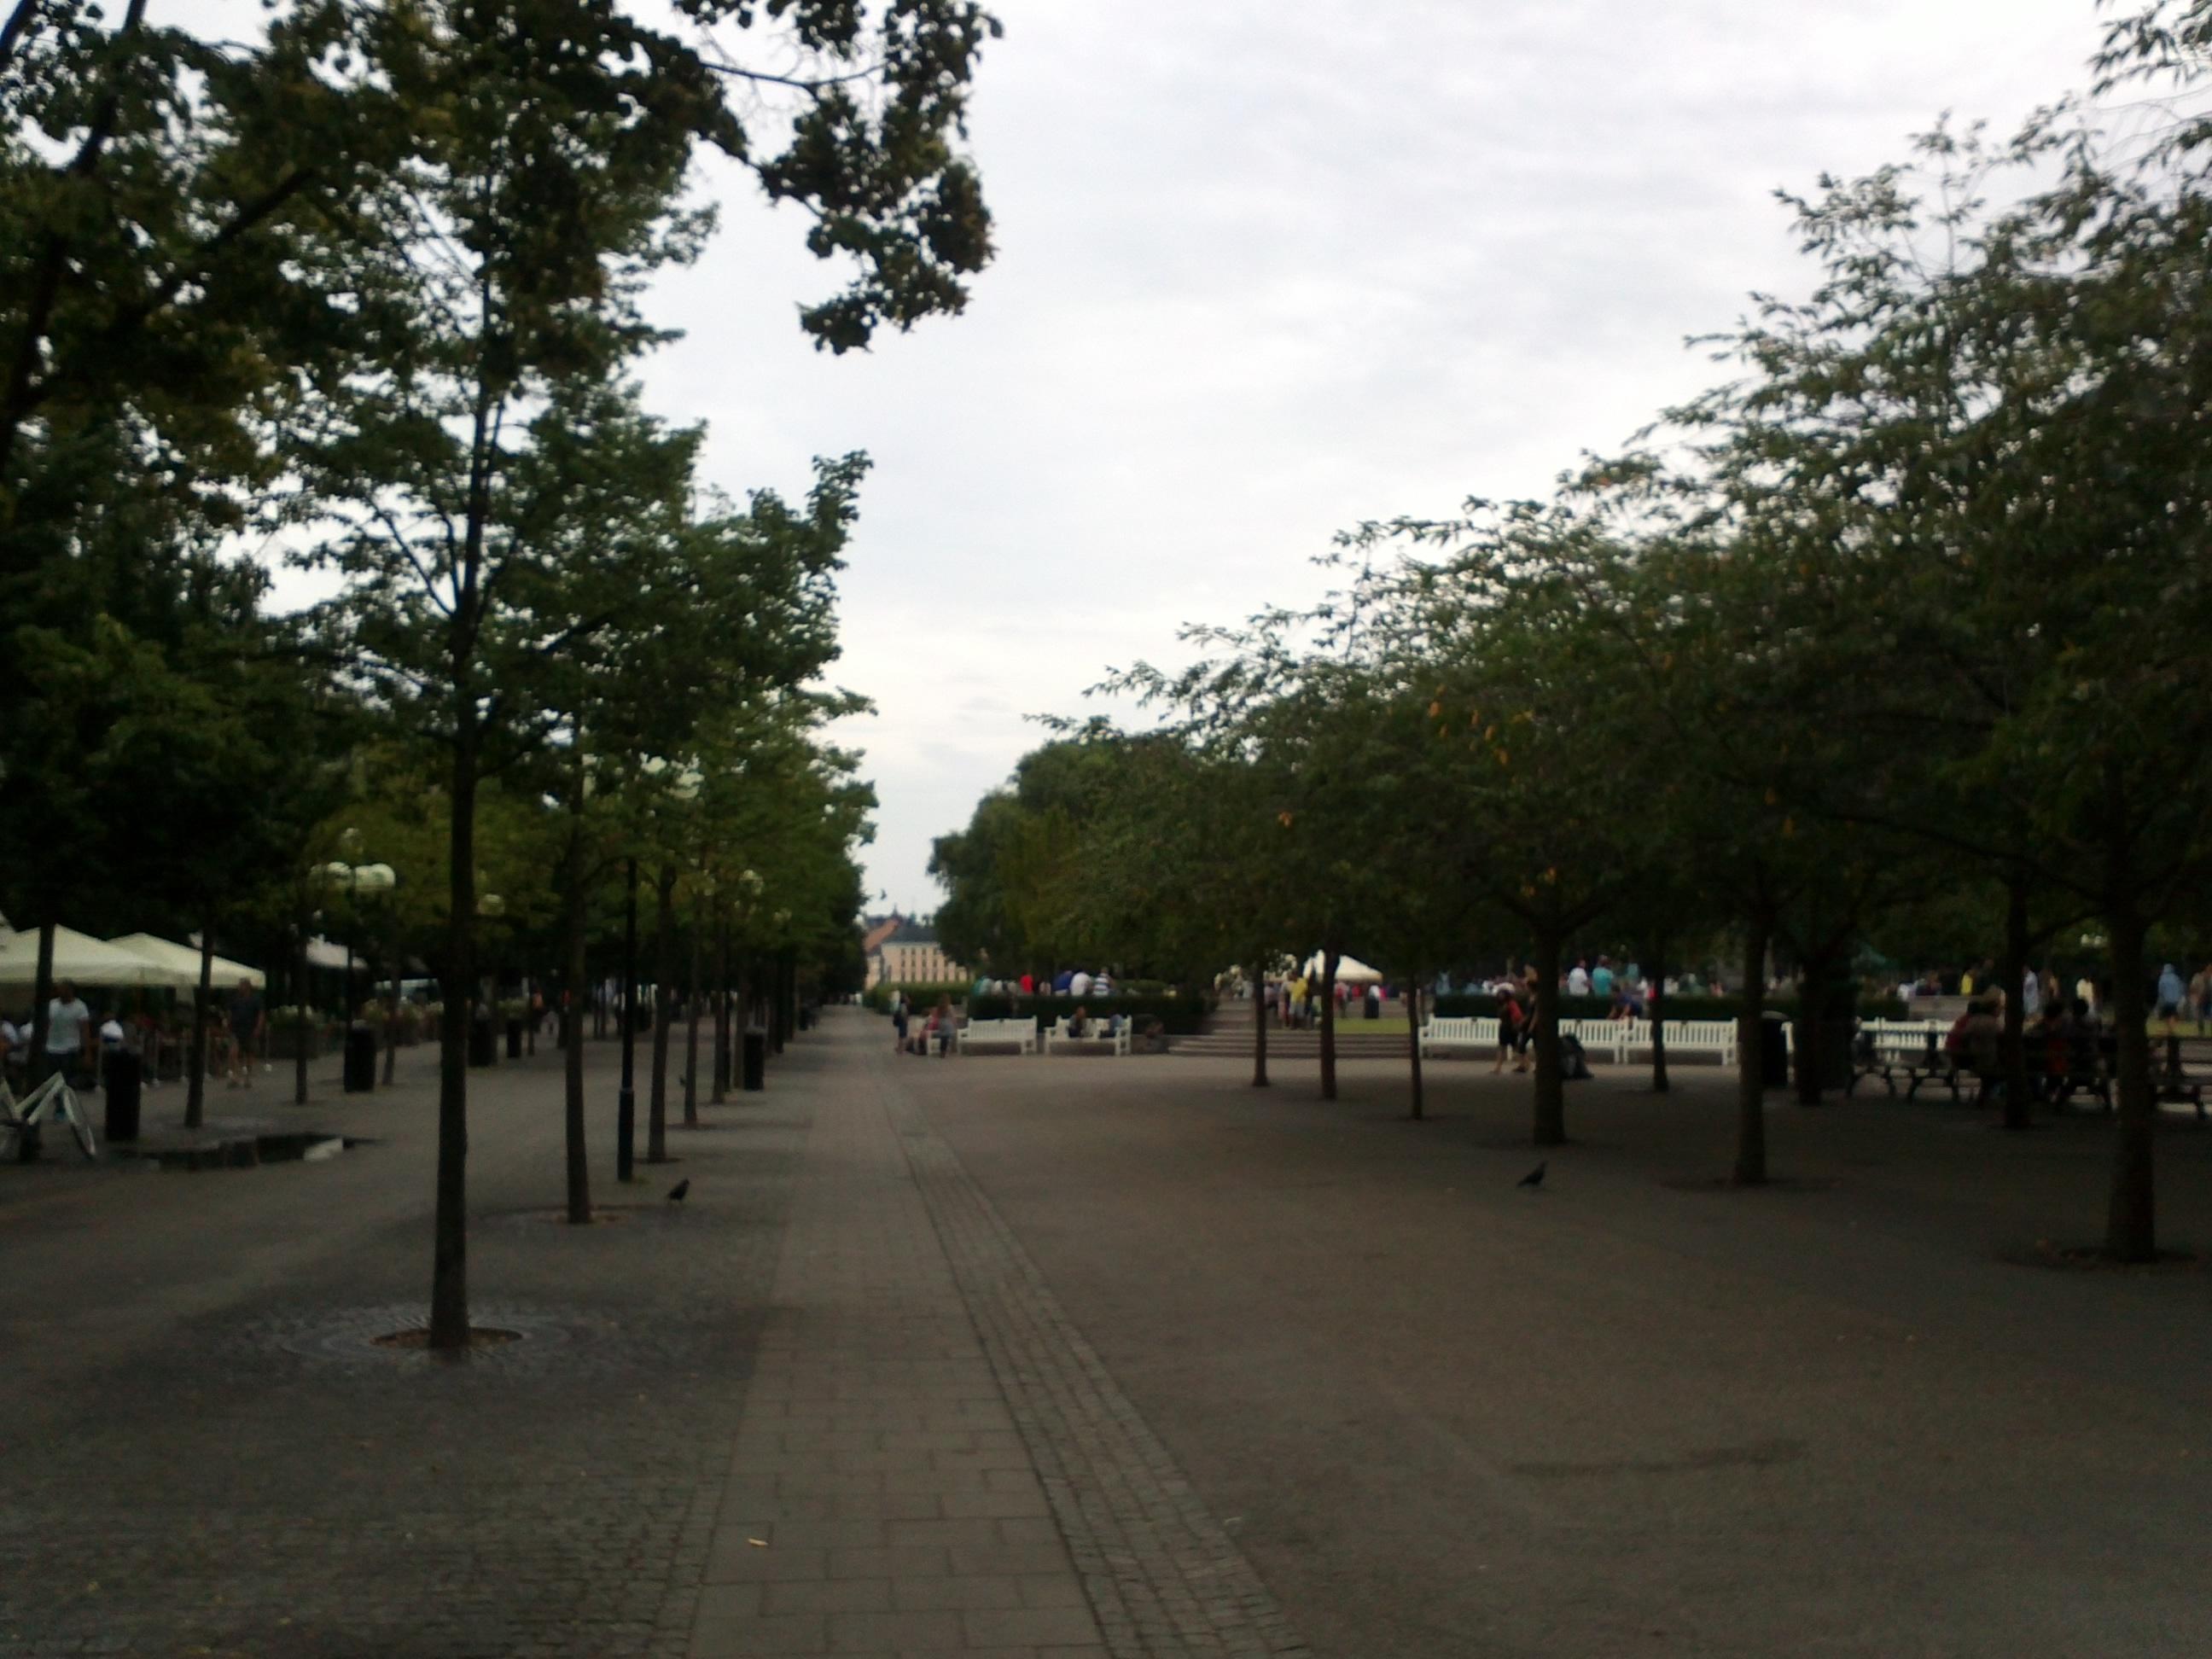 20130726_064